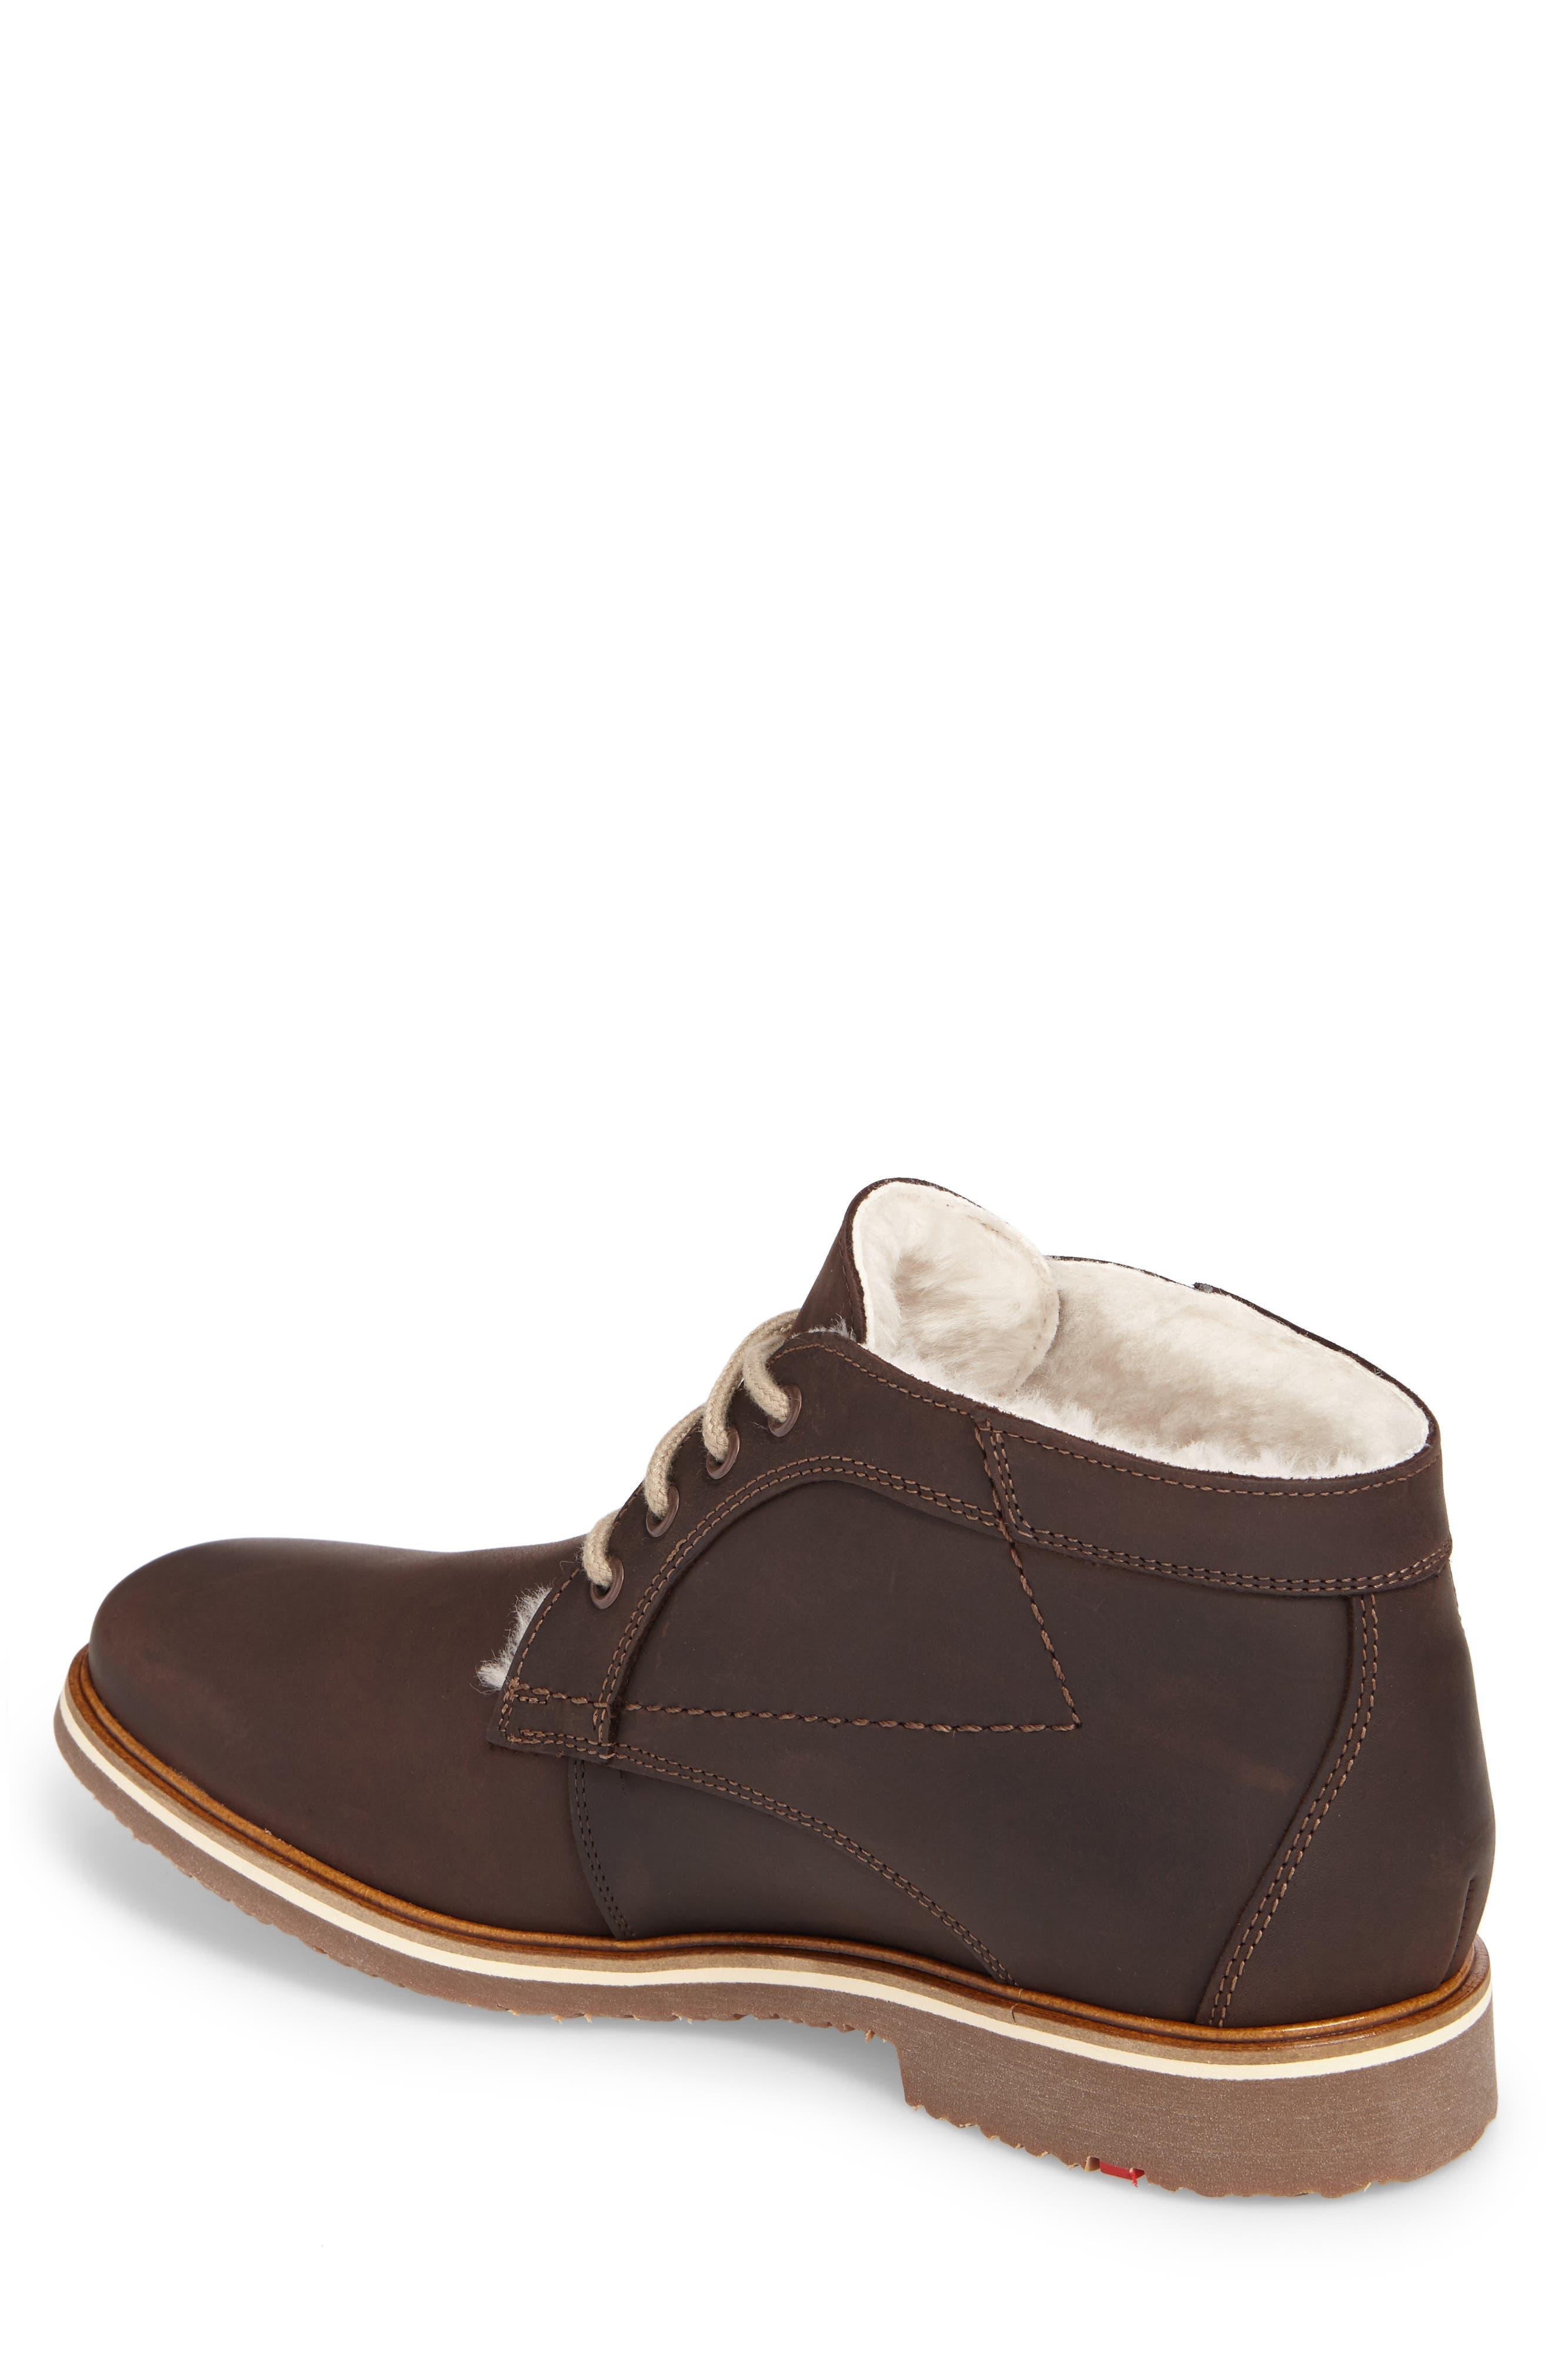 Varus Waterproof Shearlng Lined Chukka Boot,                             Alternate thumbnail 2, color,                             Ebony Leather